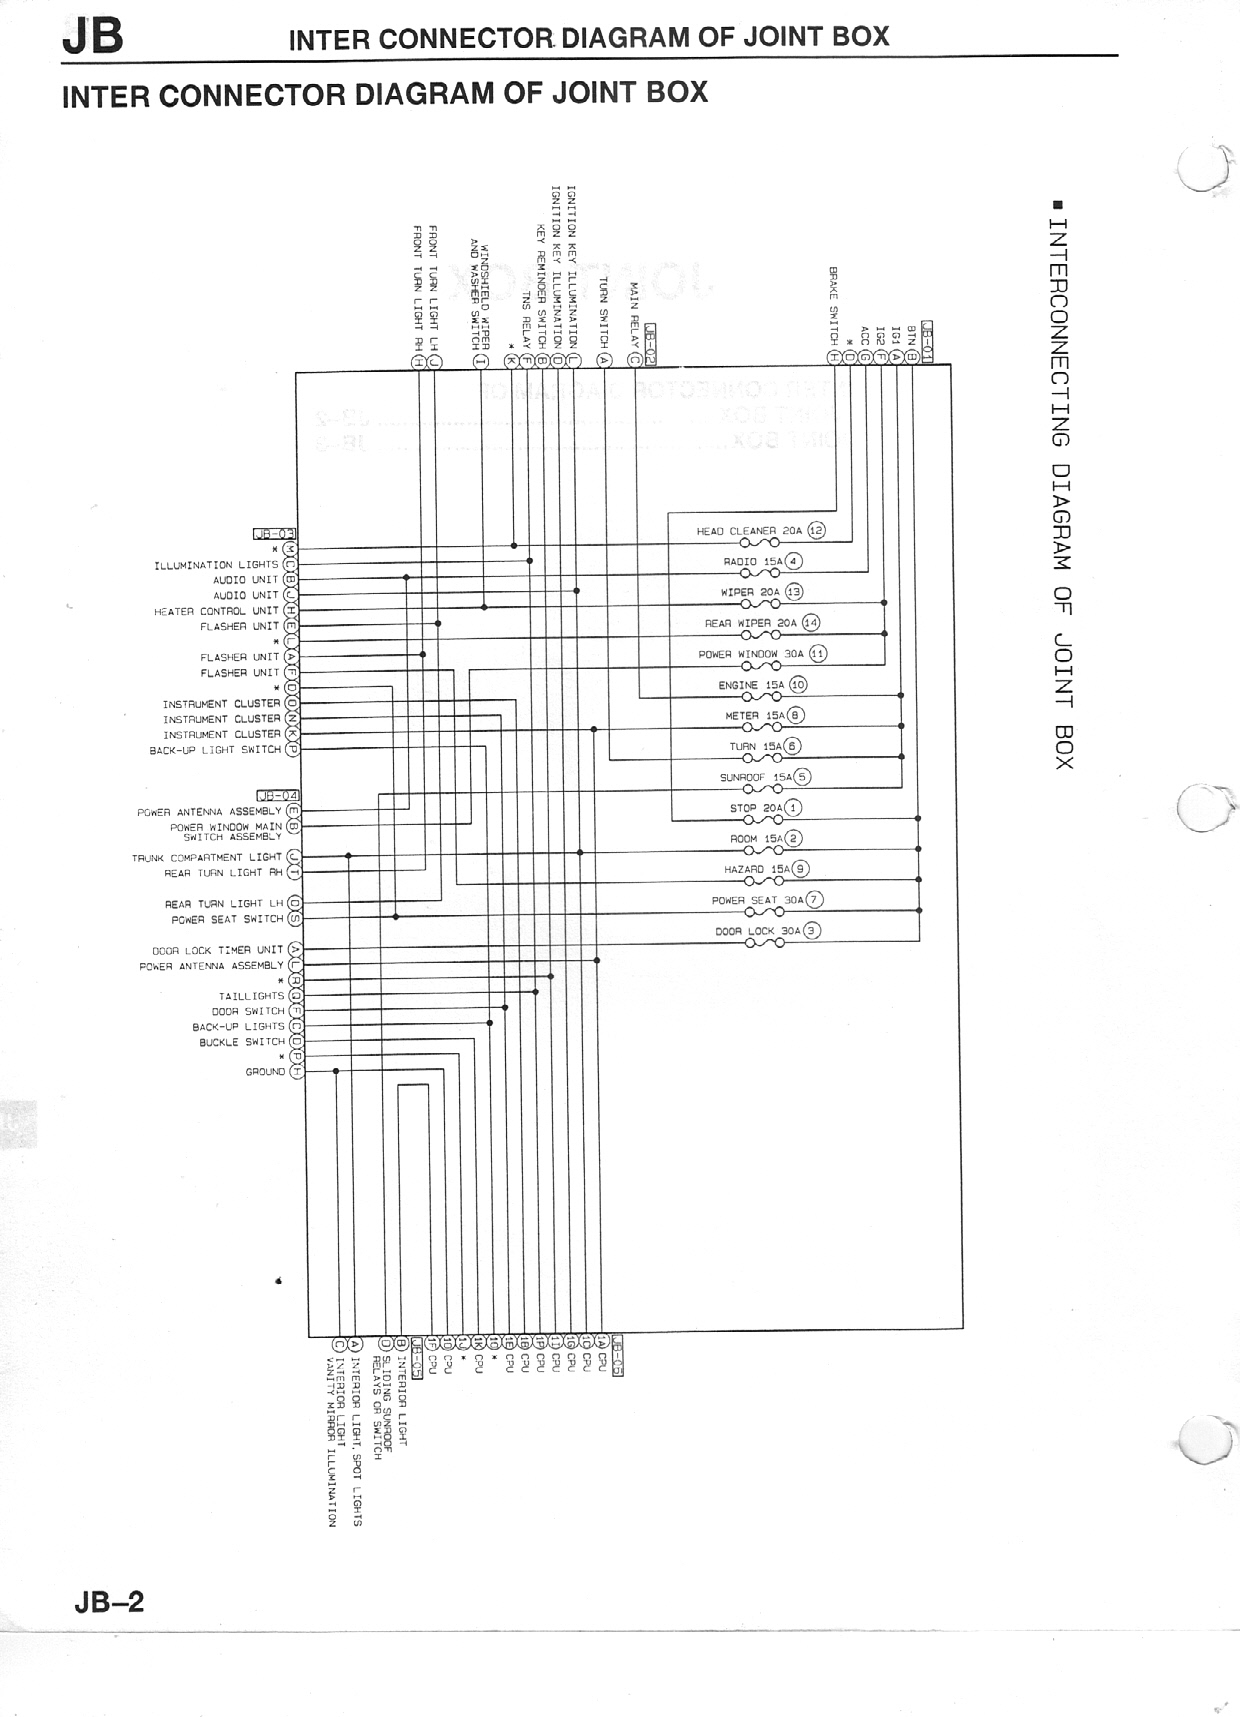 PMX626.info //US/Mazda 626 & MX-6/Work Shop Manuals/Scans